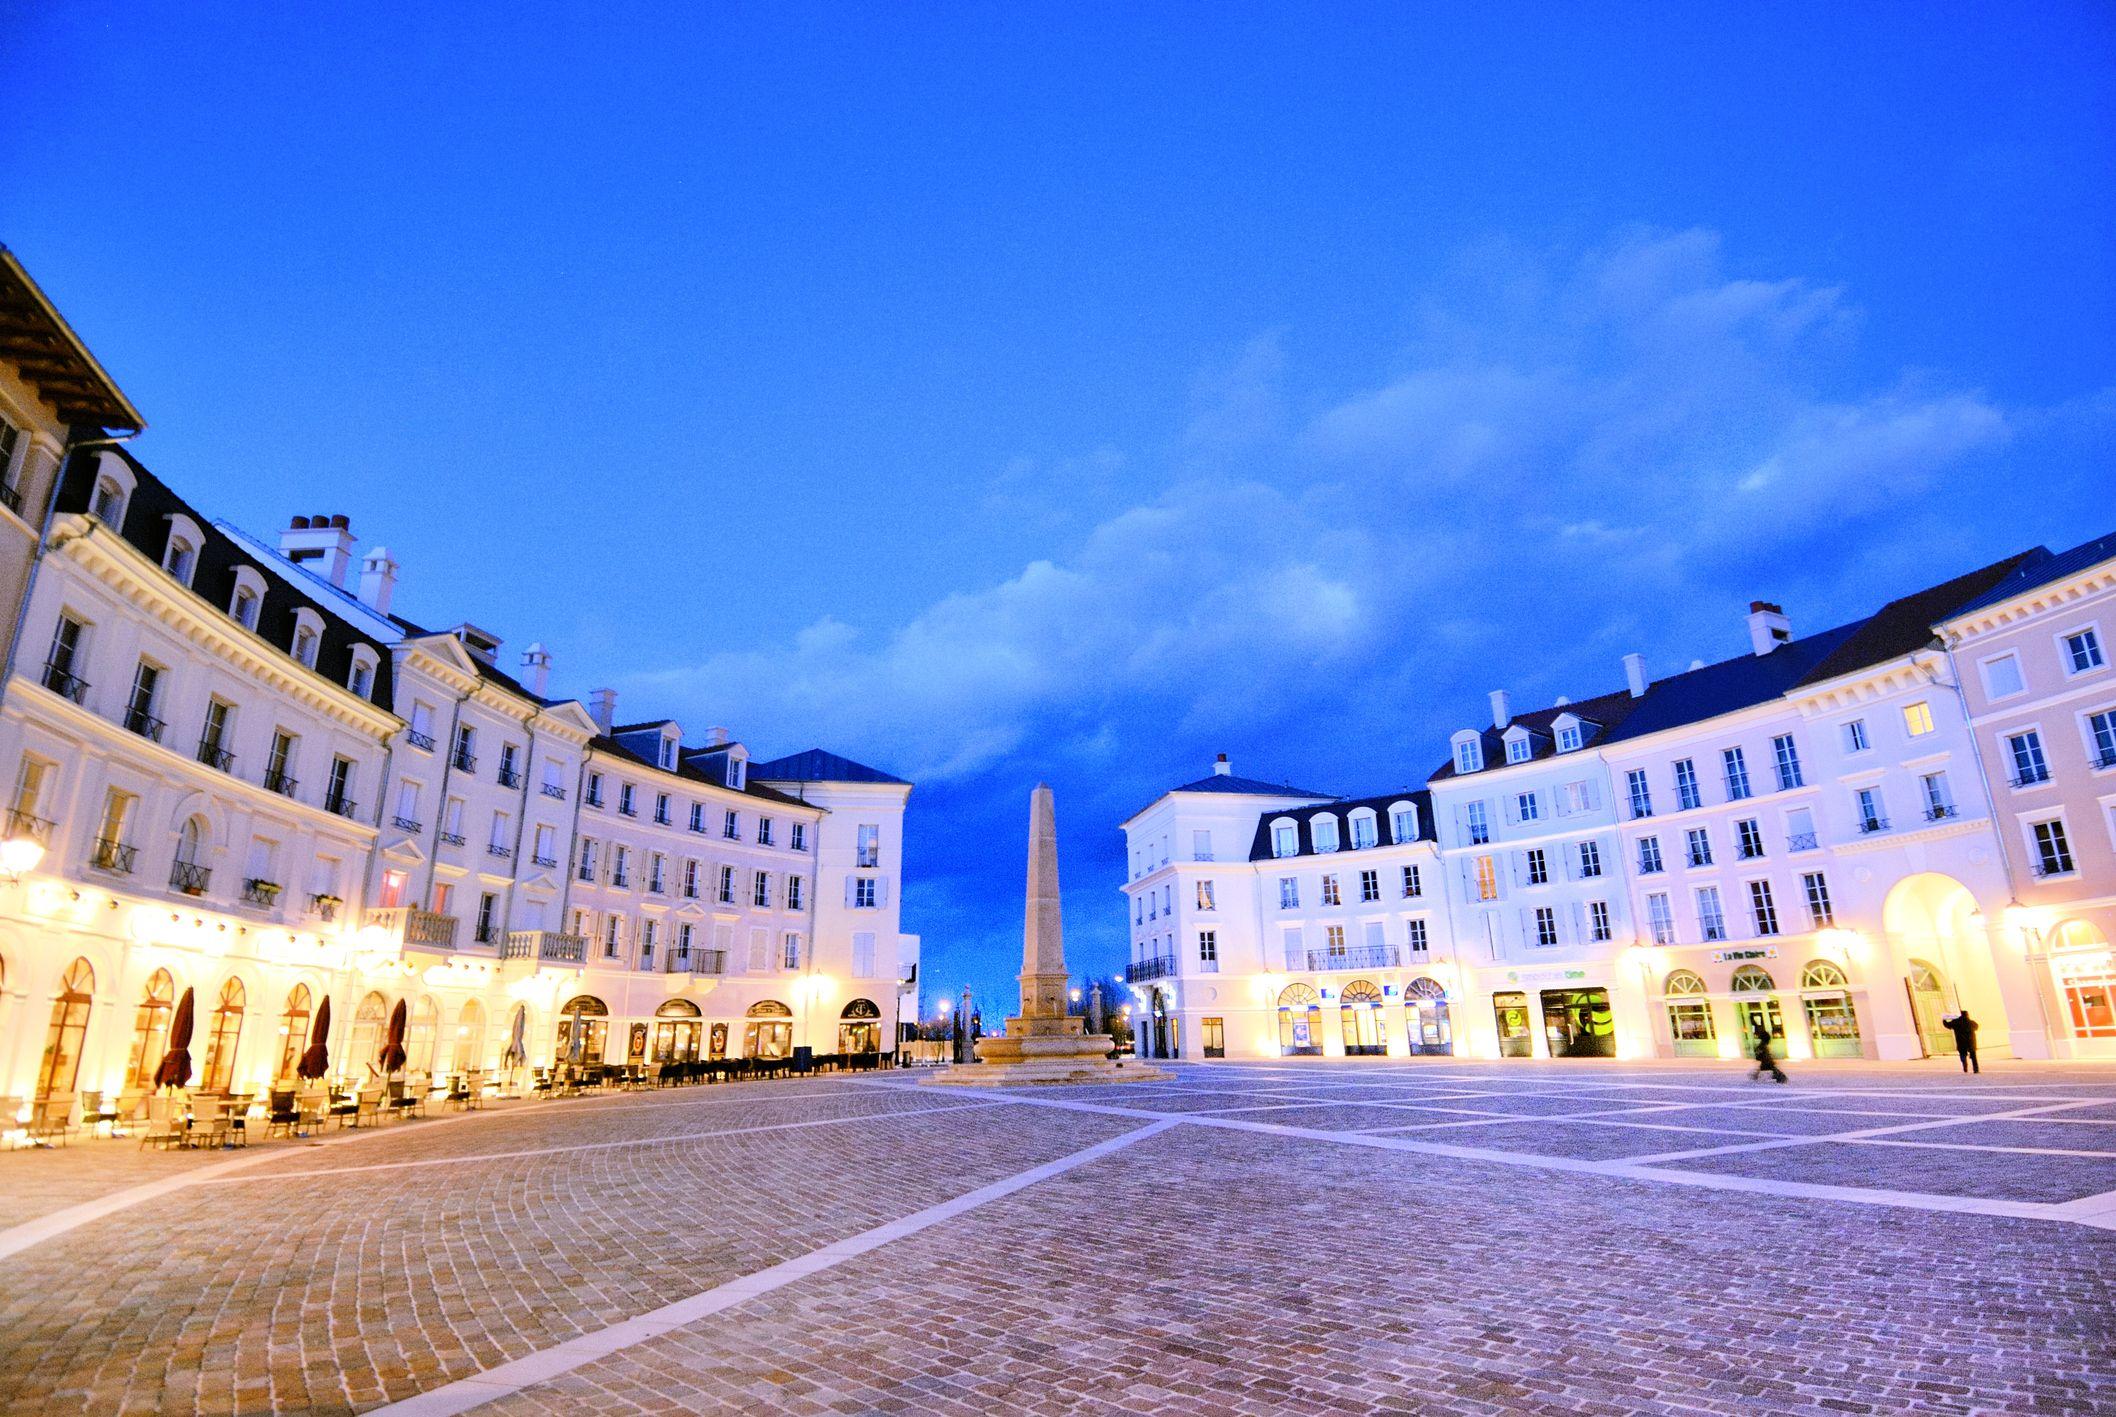 France, Serris